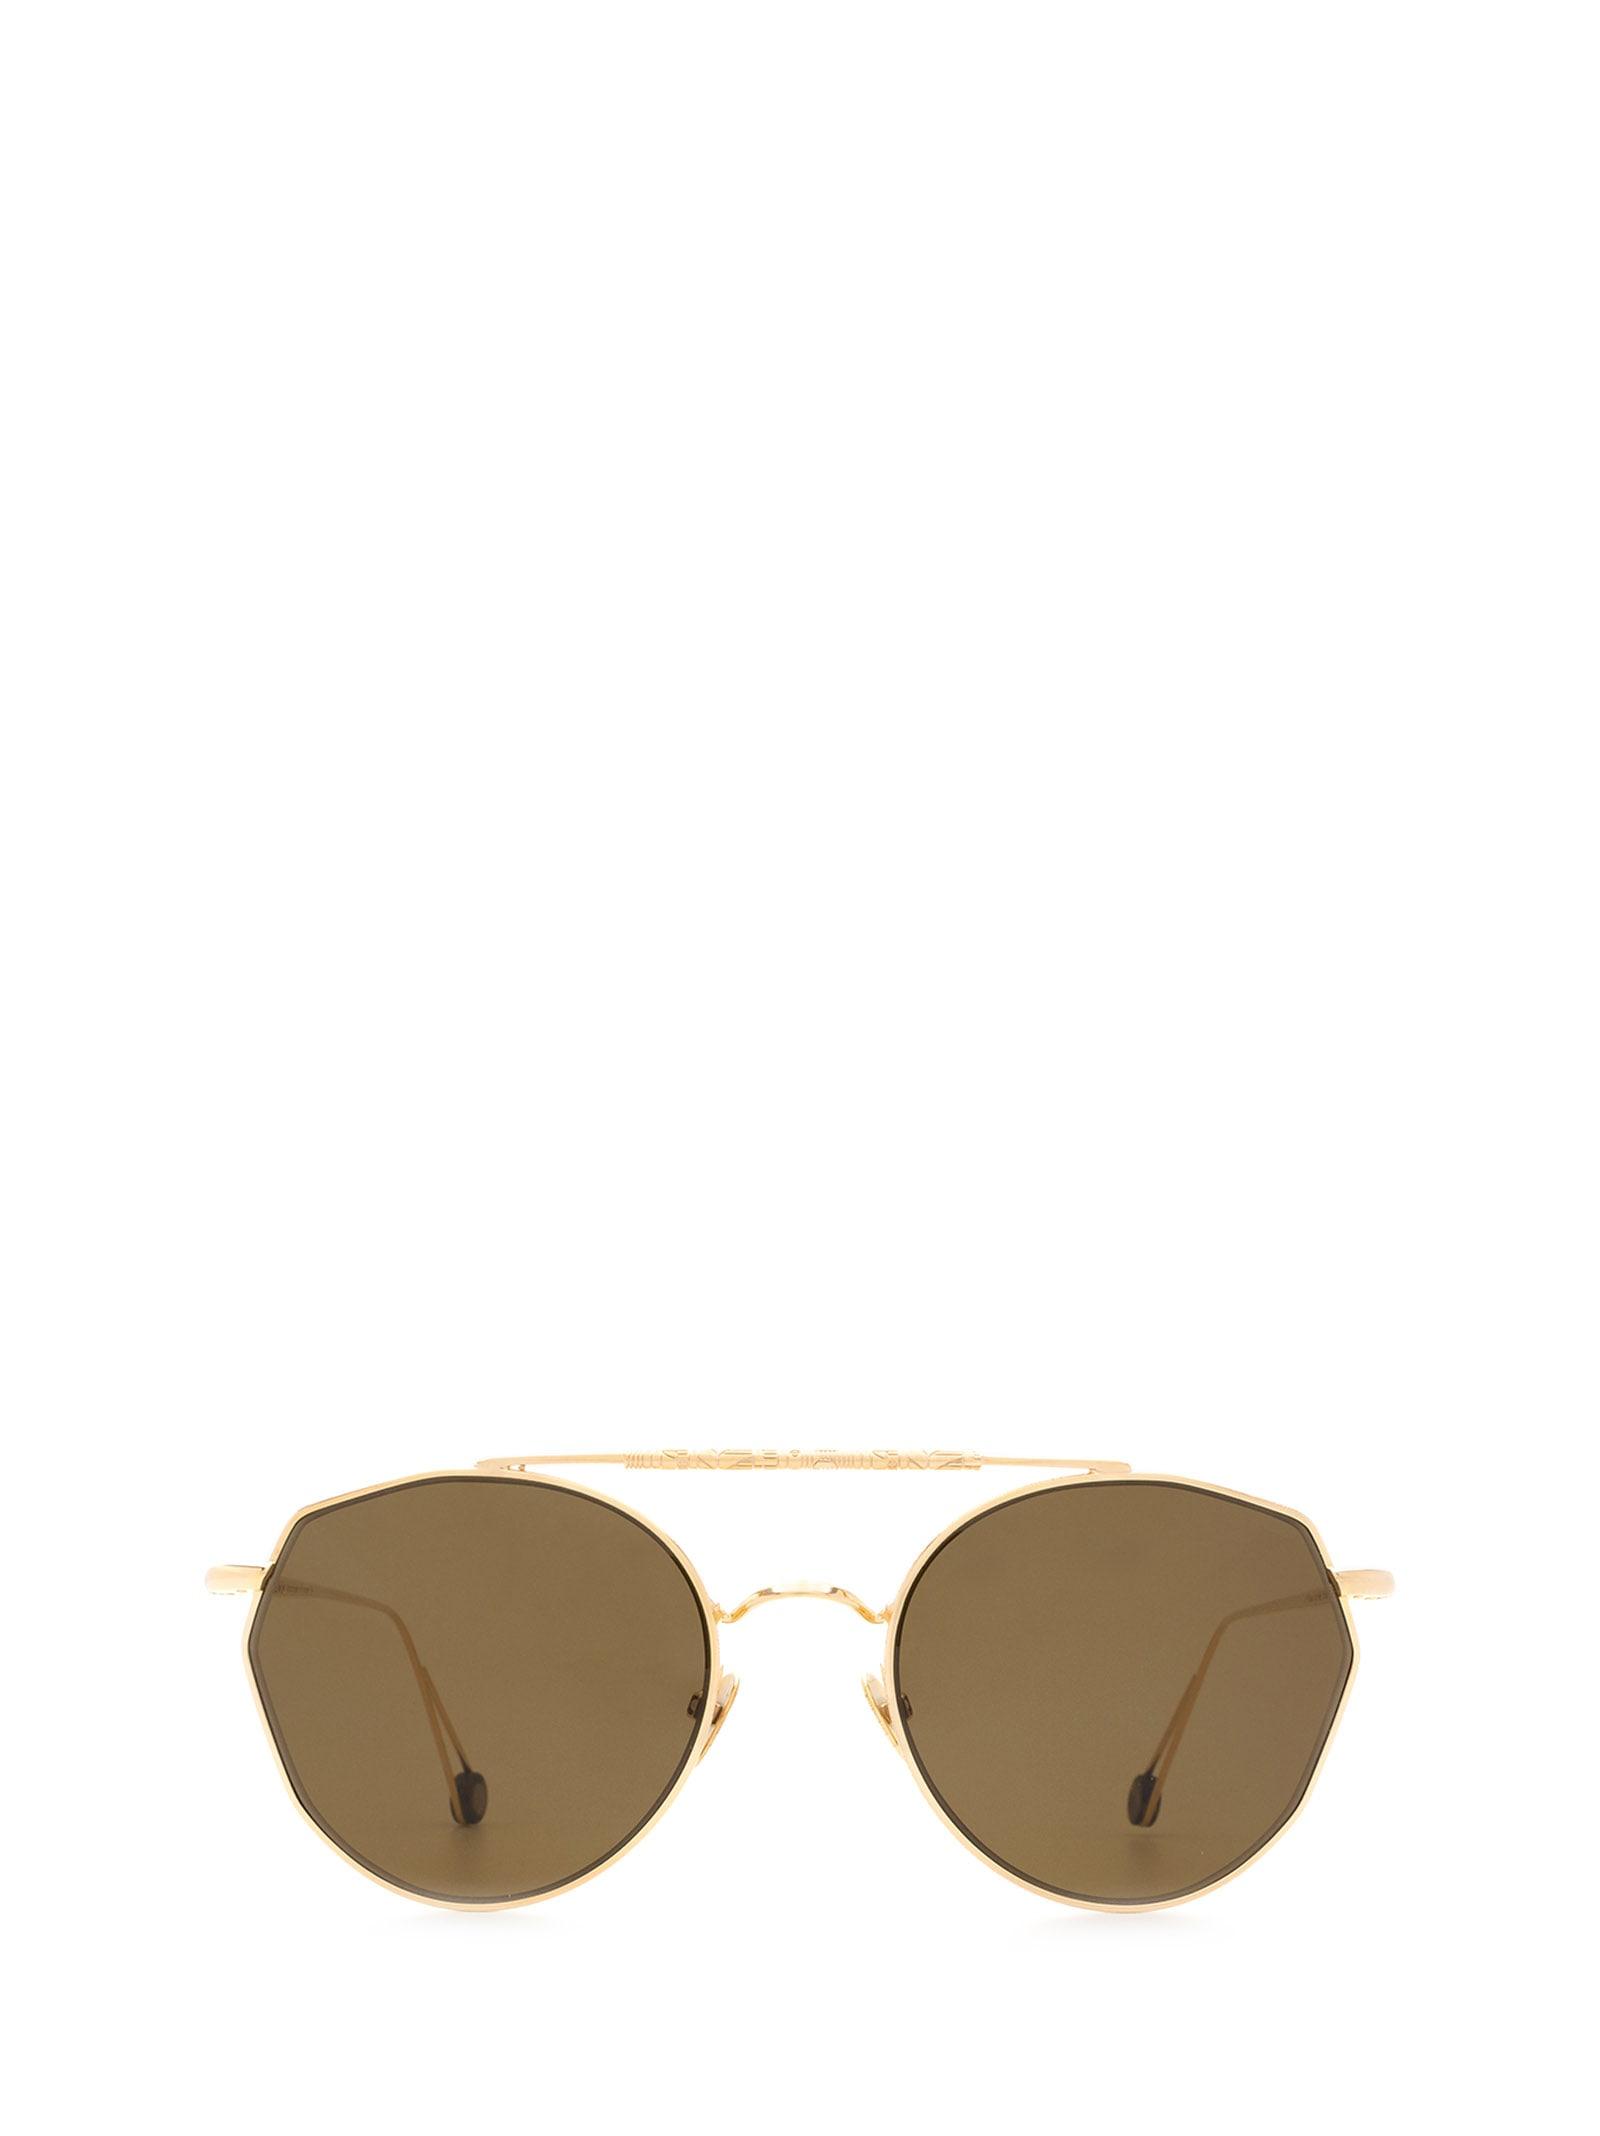 AHLEM Ahlem Place Carree Champagne Sunglasses